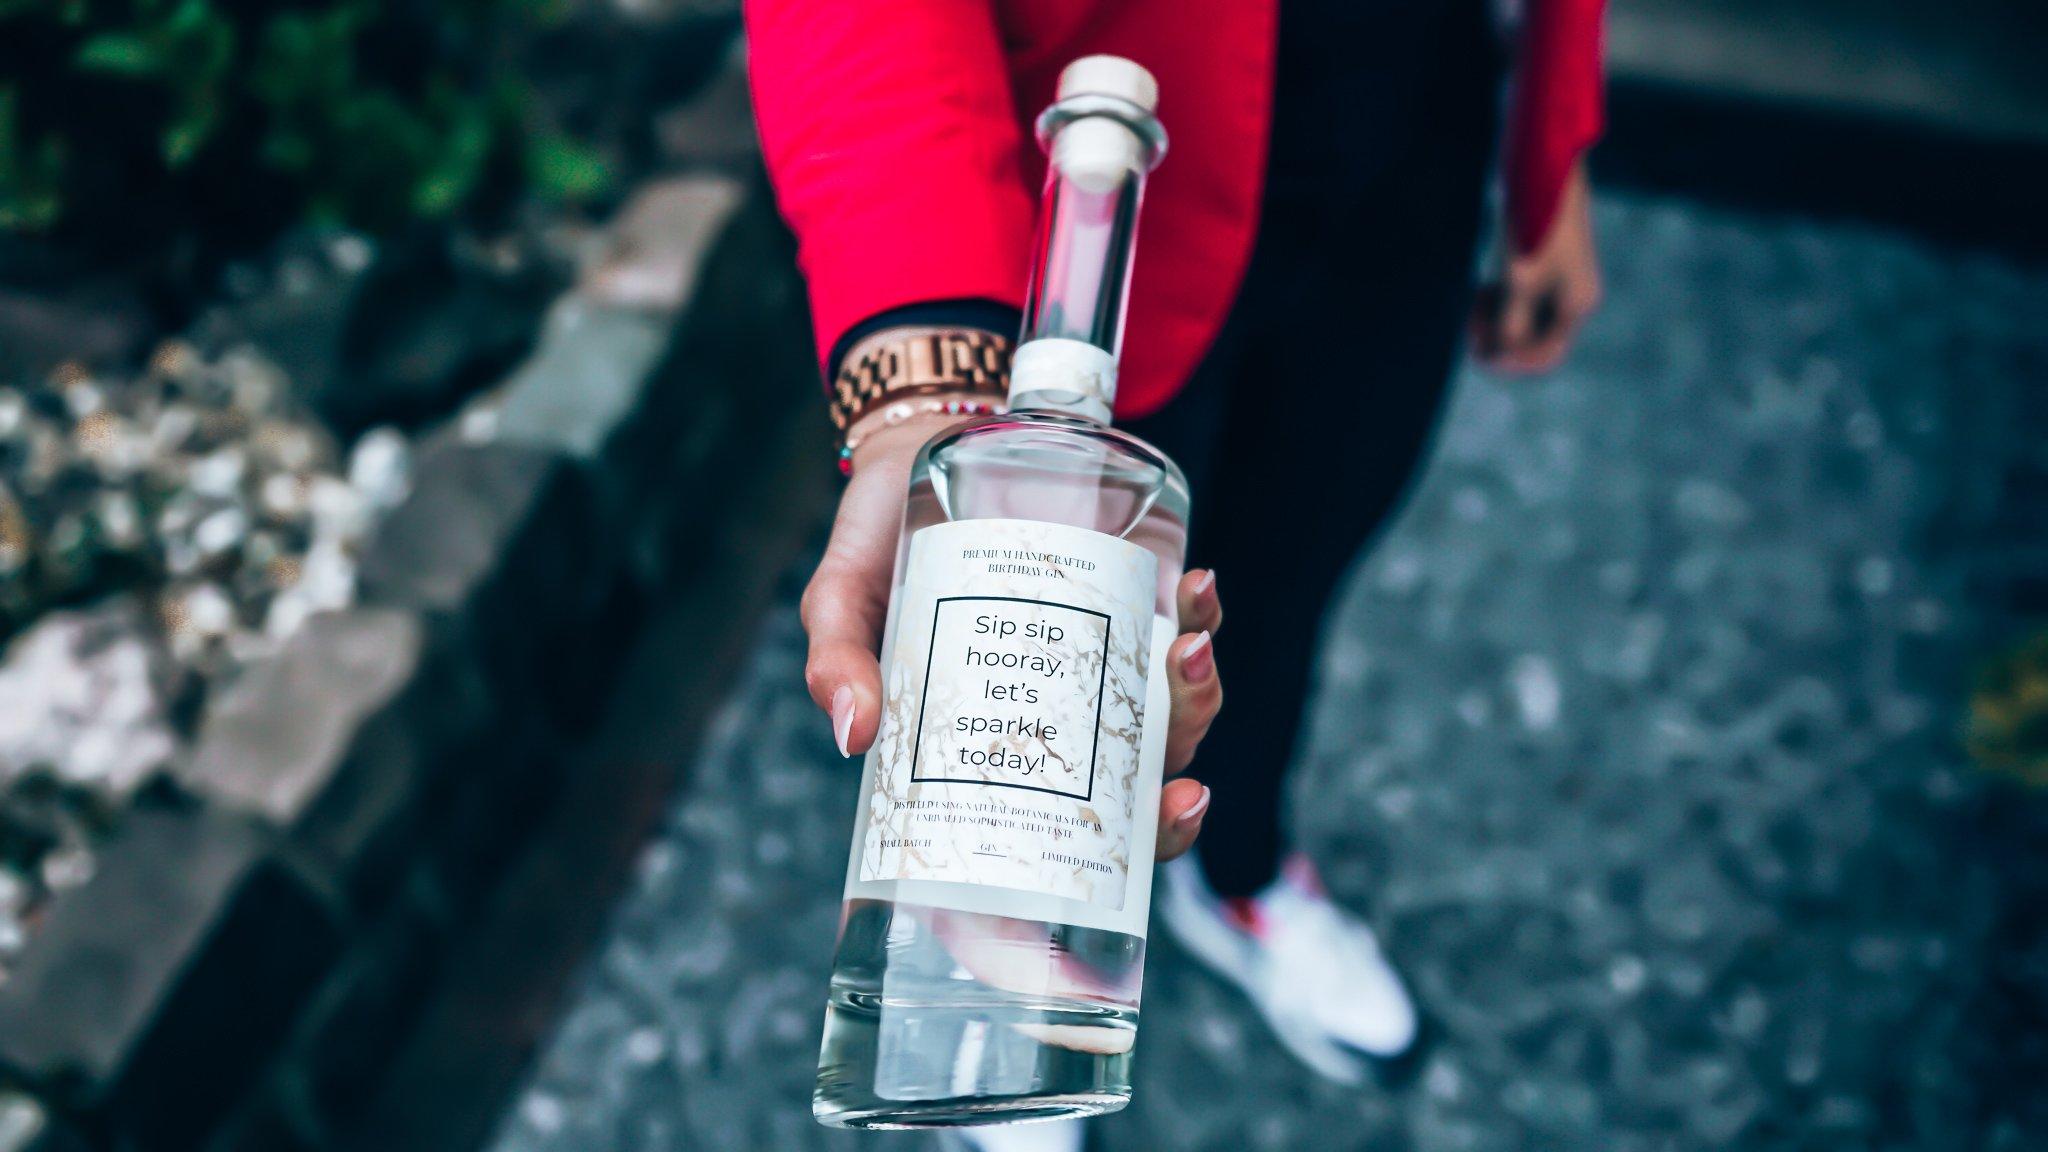 Sip sip hooray, Maak je eigen gin- verjaardag, Alles over gin.